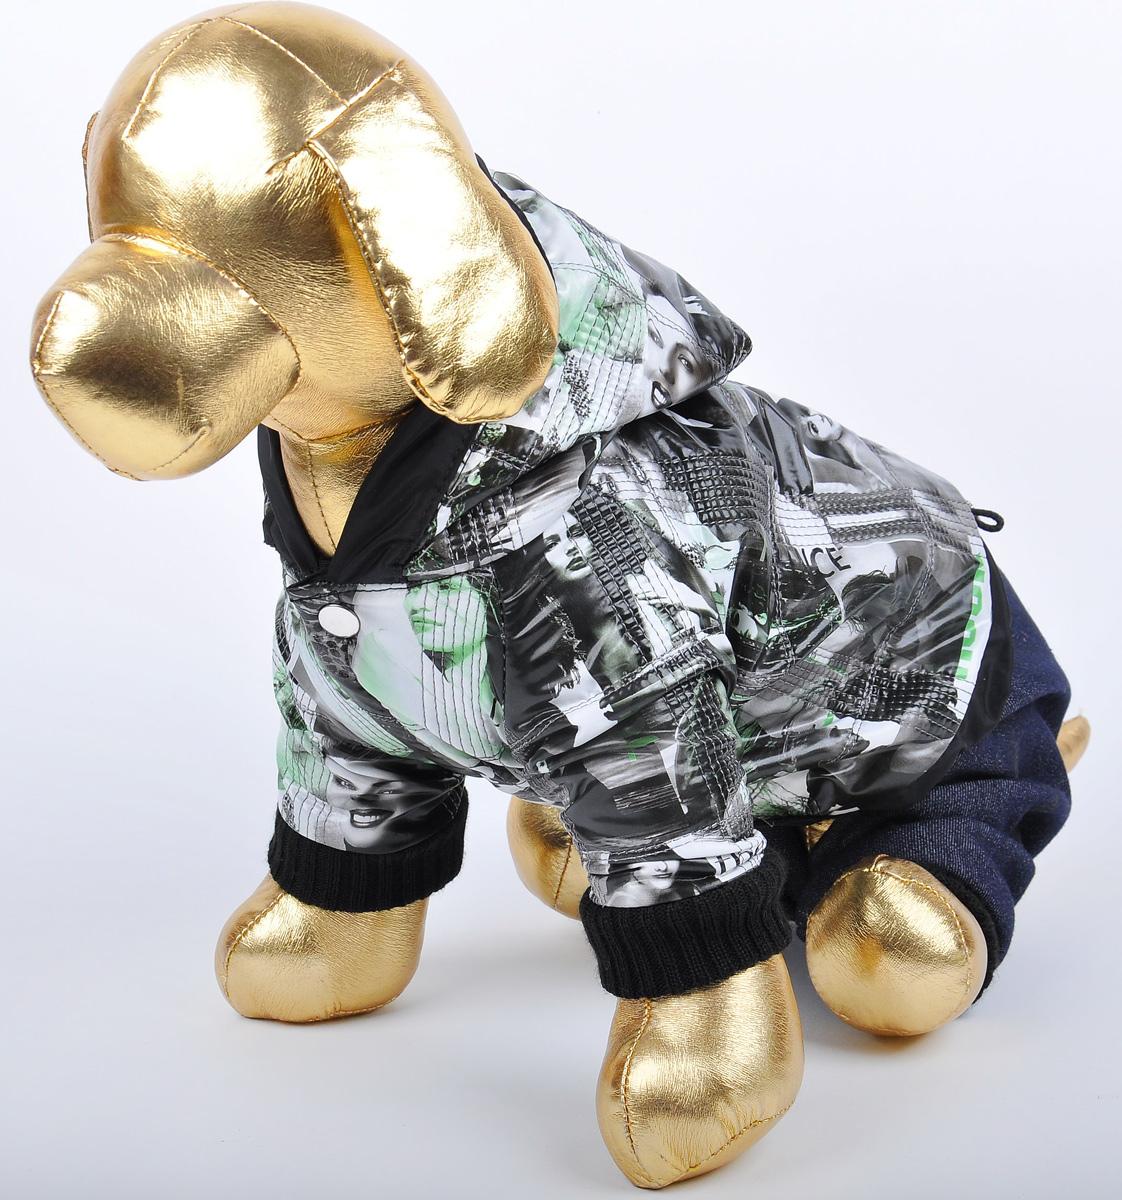 Куртка со штанами для собак GLG Столица. Размер L0120710Куртка с джинсовыми штанами для собак столица, материал куртка болонья, штаны джинса х/б, размер-L, длина спины27-29см, объем груди-37-39см.